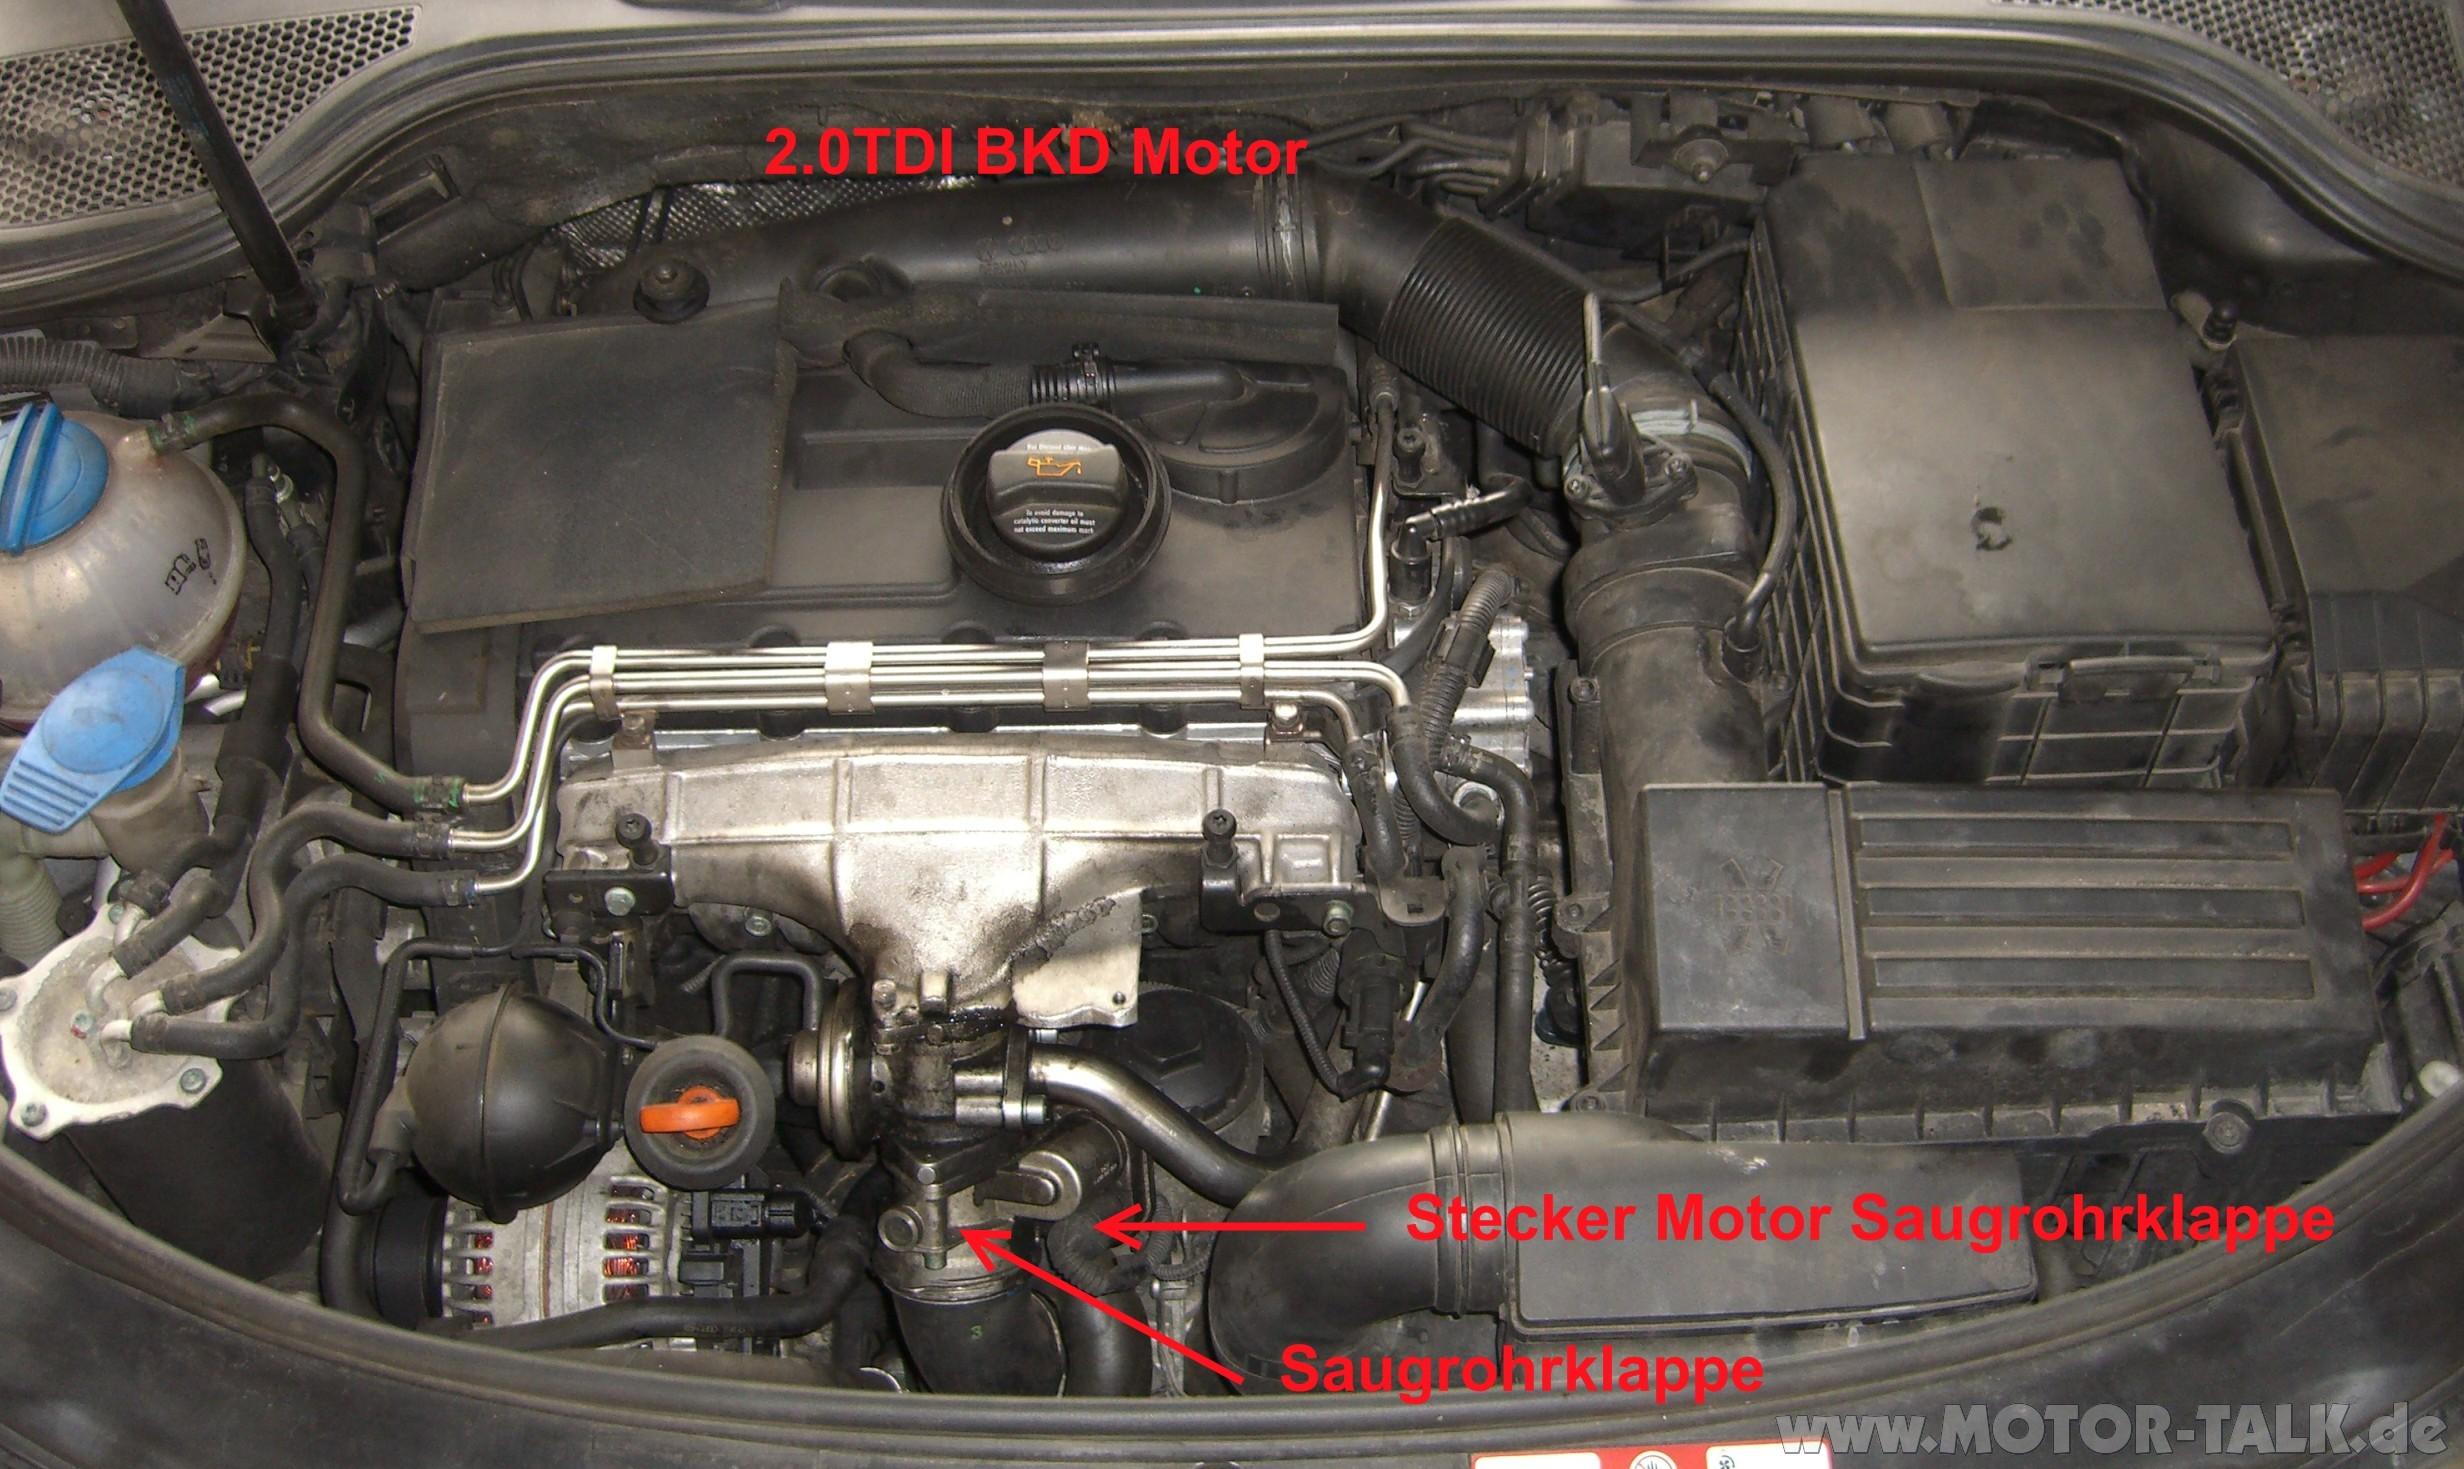 Fehler Motor F 252 R Saugrohrklappe Audi A3 8p Amp 8pa